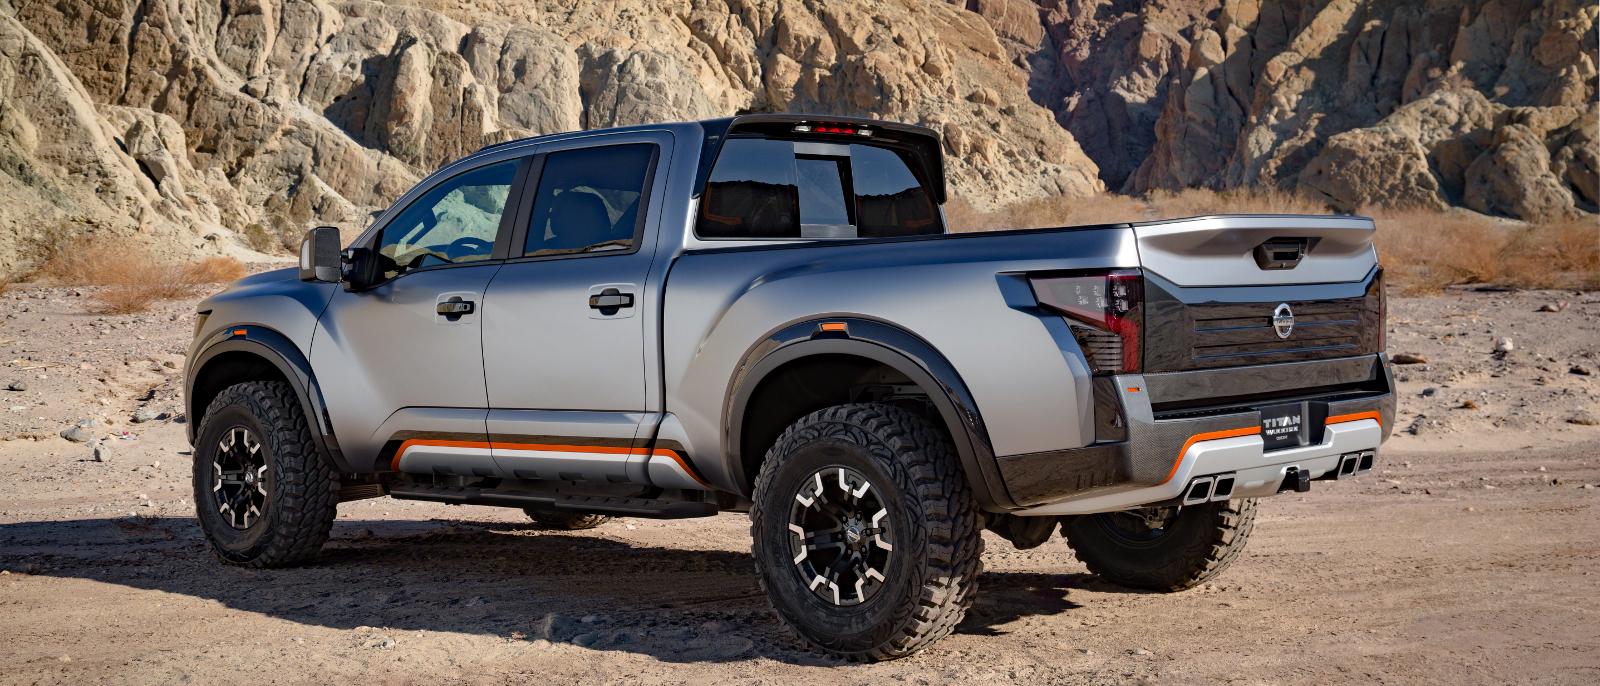 2016 Nissan Titan Warrior rear exterior